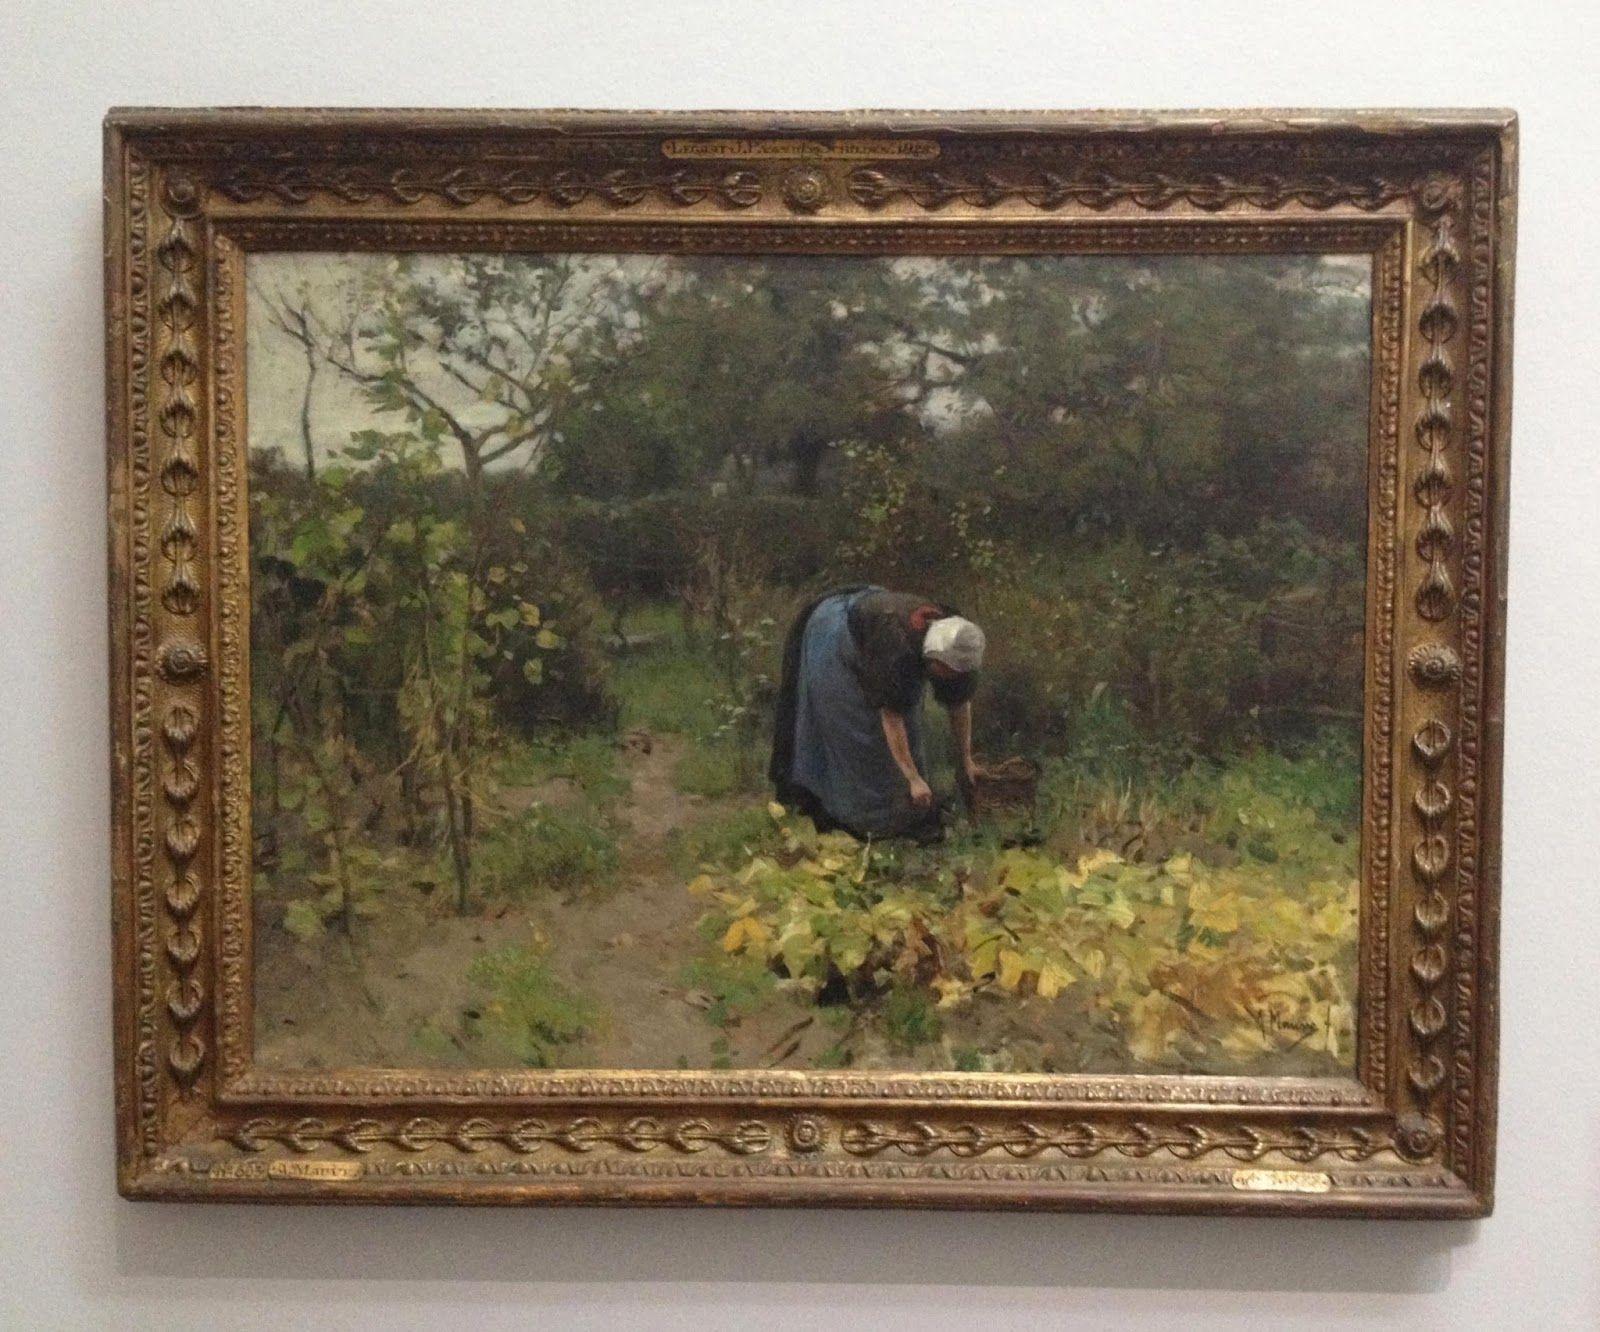 Anton Mauve - in the vegetable garden - 1887 avelienthoben.blogspot.com